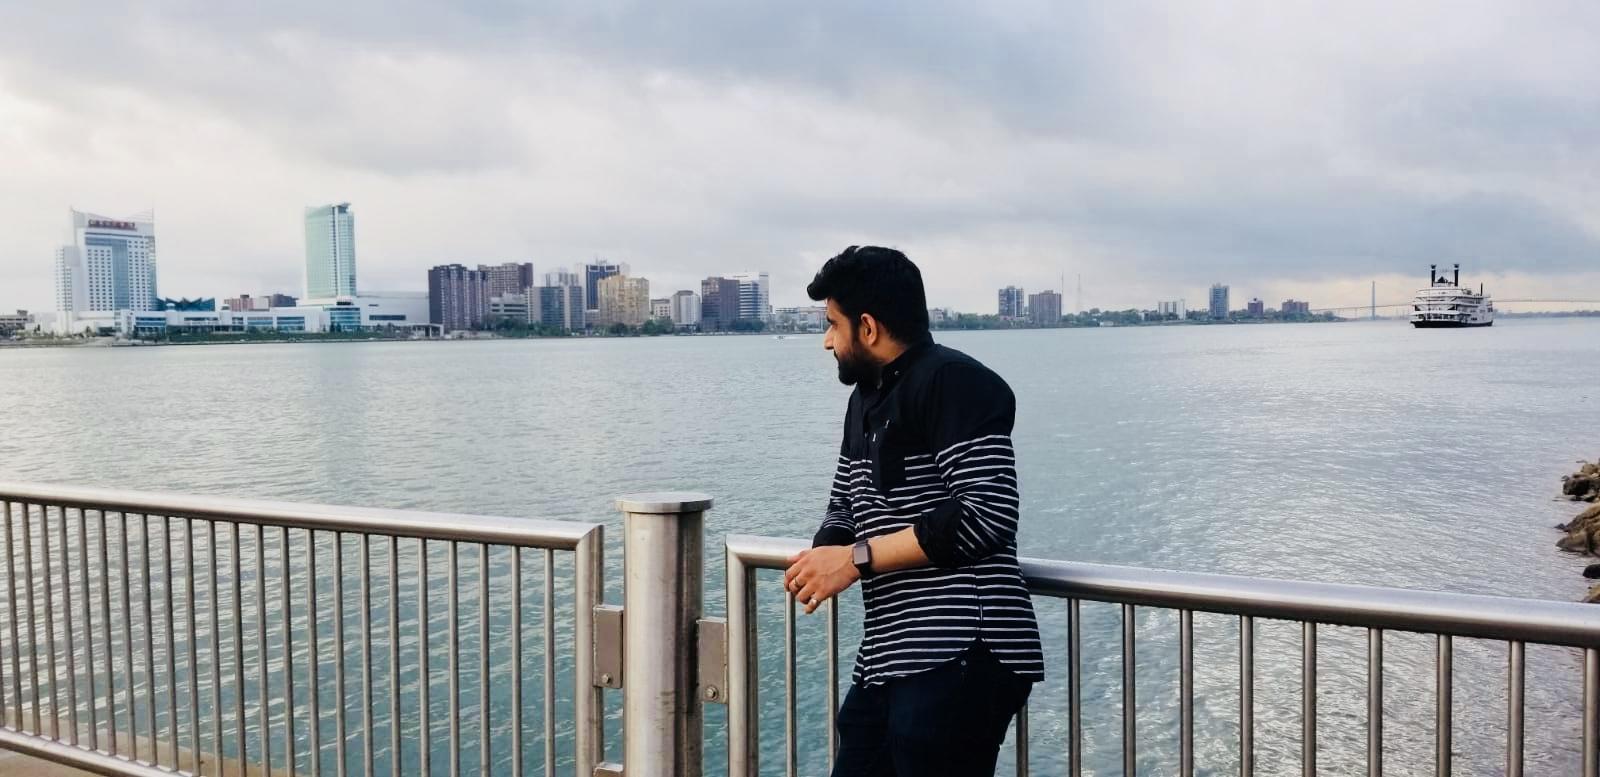 ishant nayyar usa trip may 2018 - usa canada border